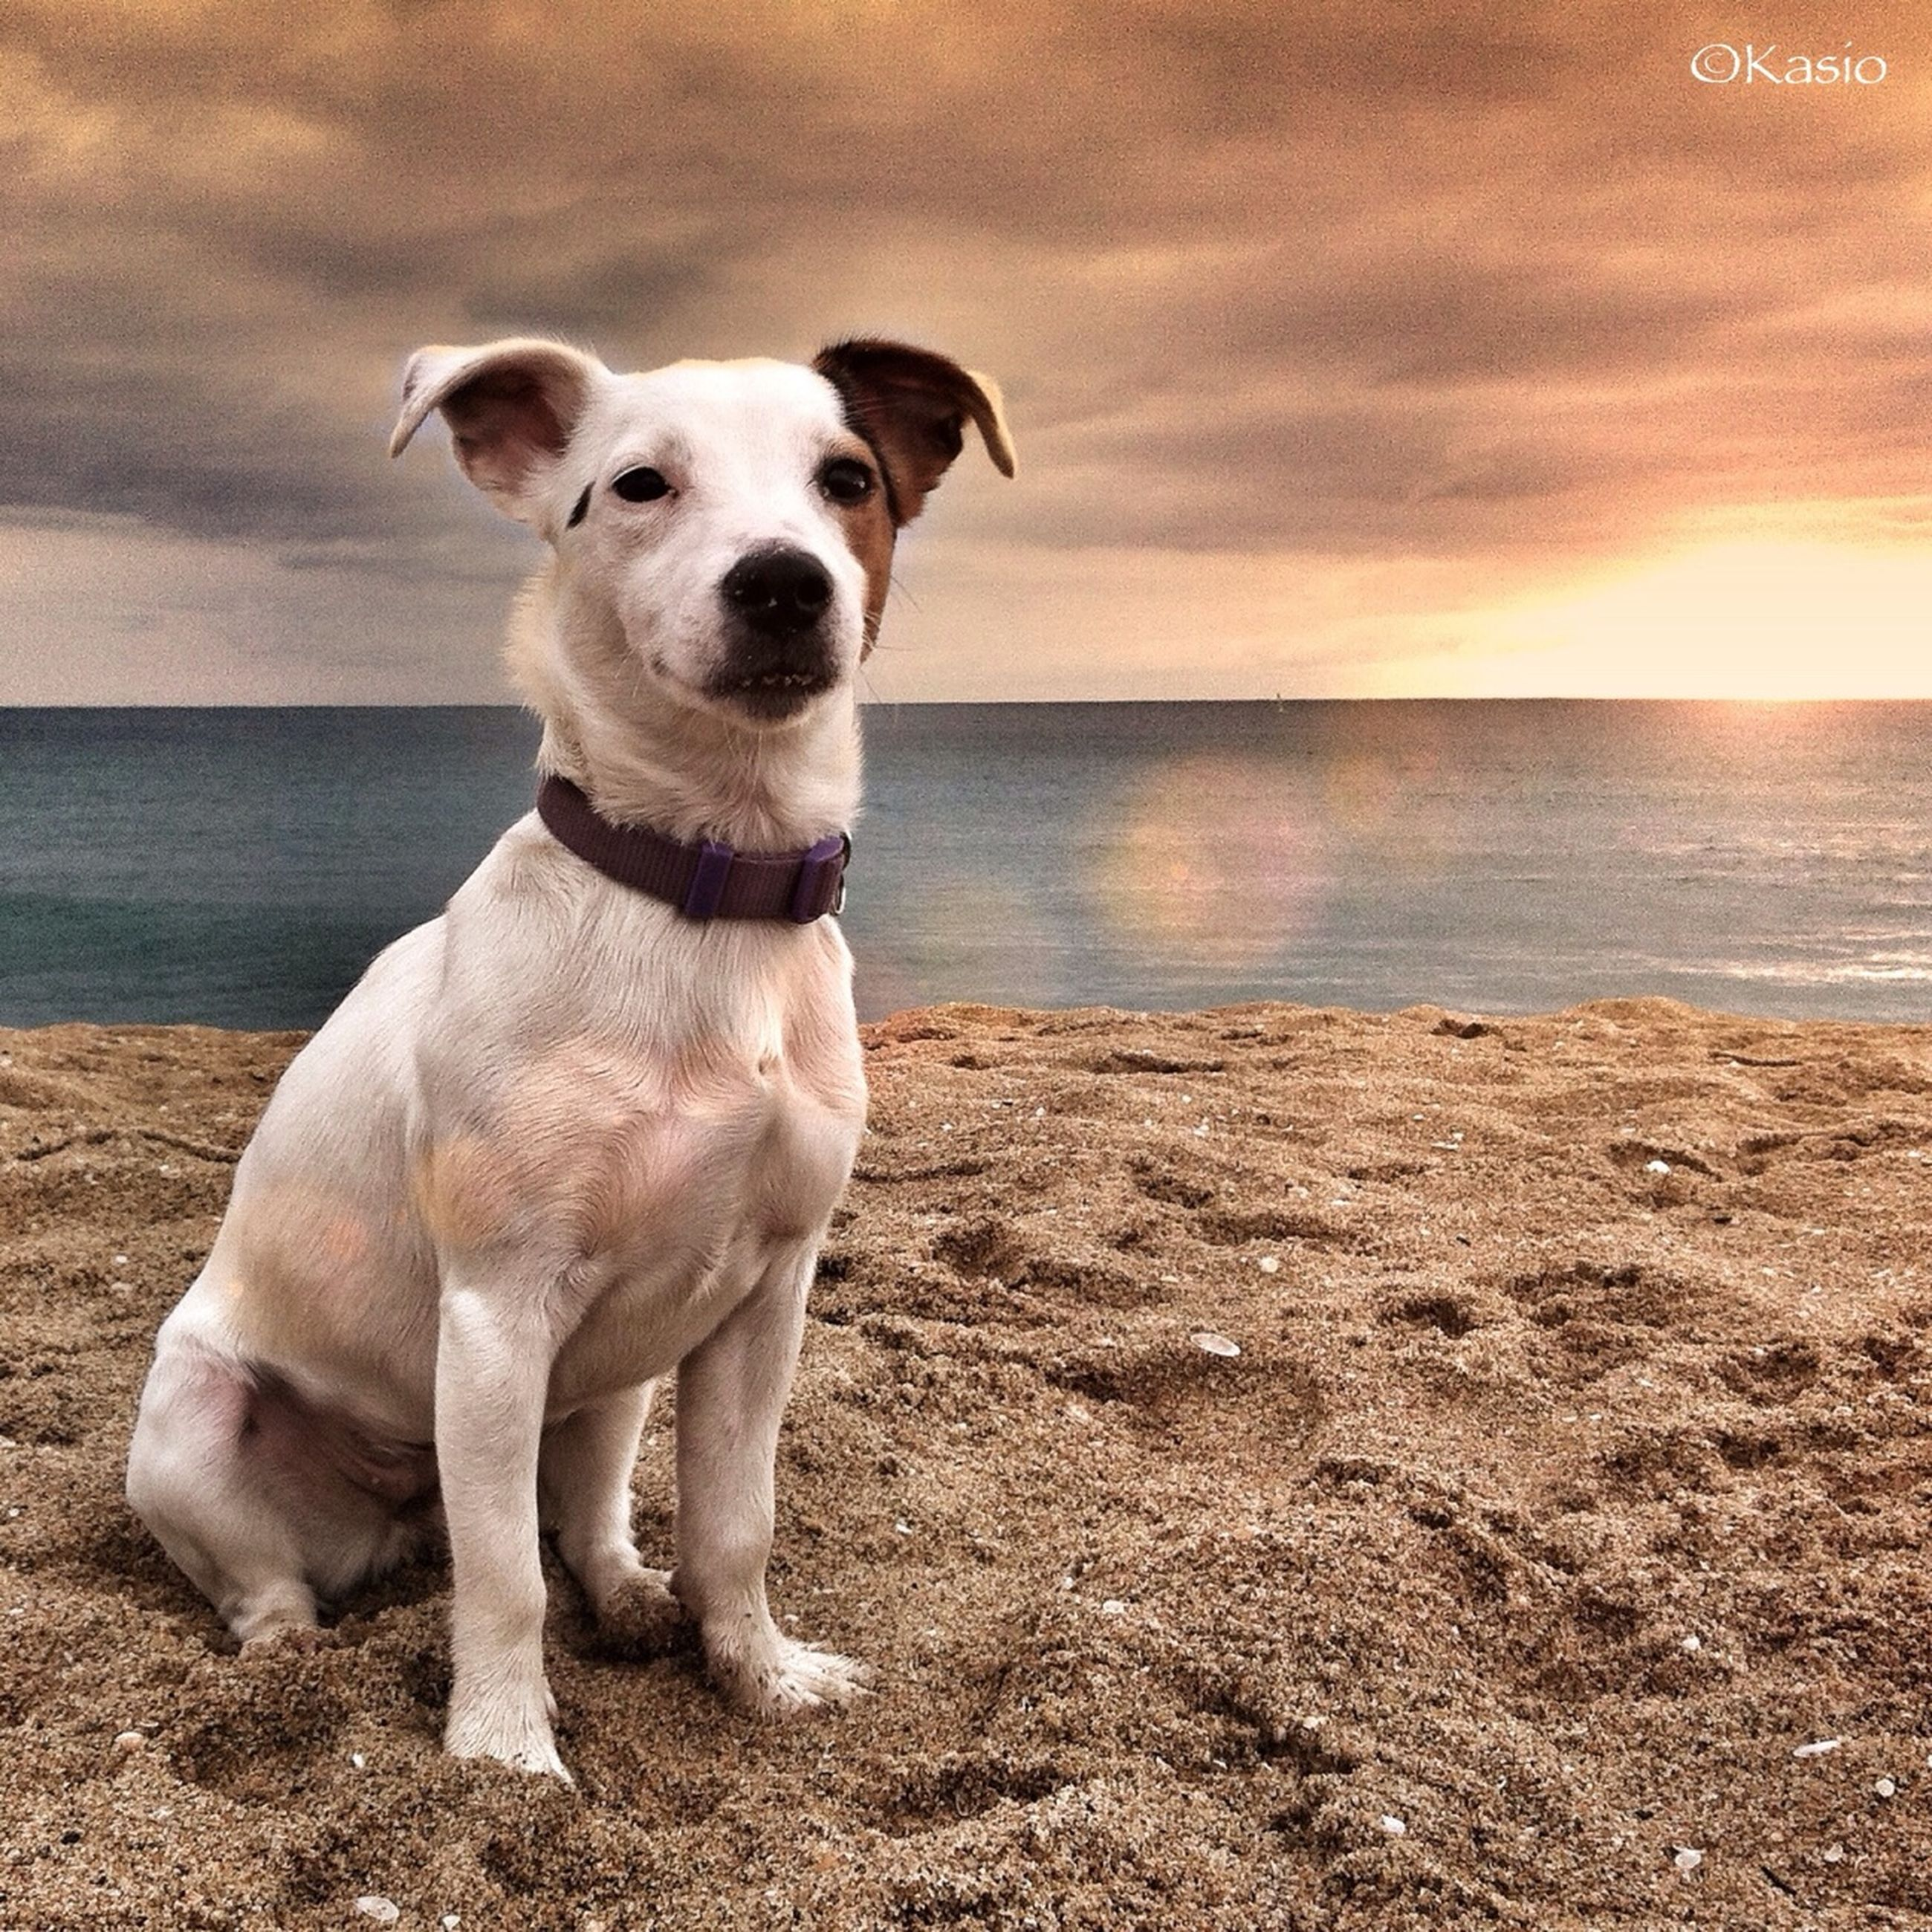 dog, domestic animals, animal themes, mammal, one animal, pets, beach, sea, horizon over water, sky, water, shore, sunset, full length, sand, standing, nature, sunlight, tranquil scene, sitting